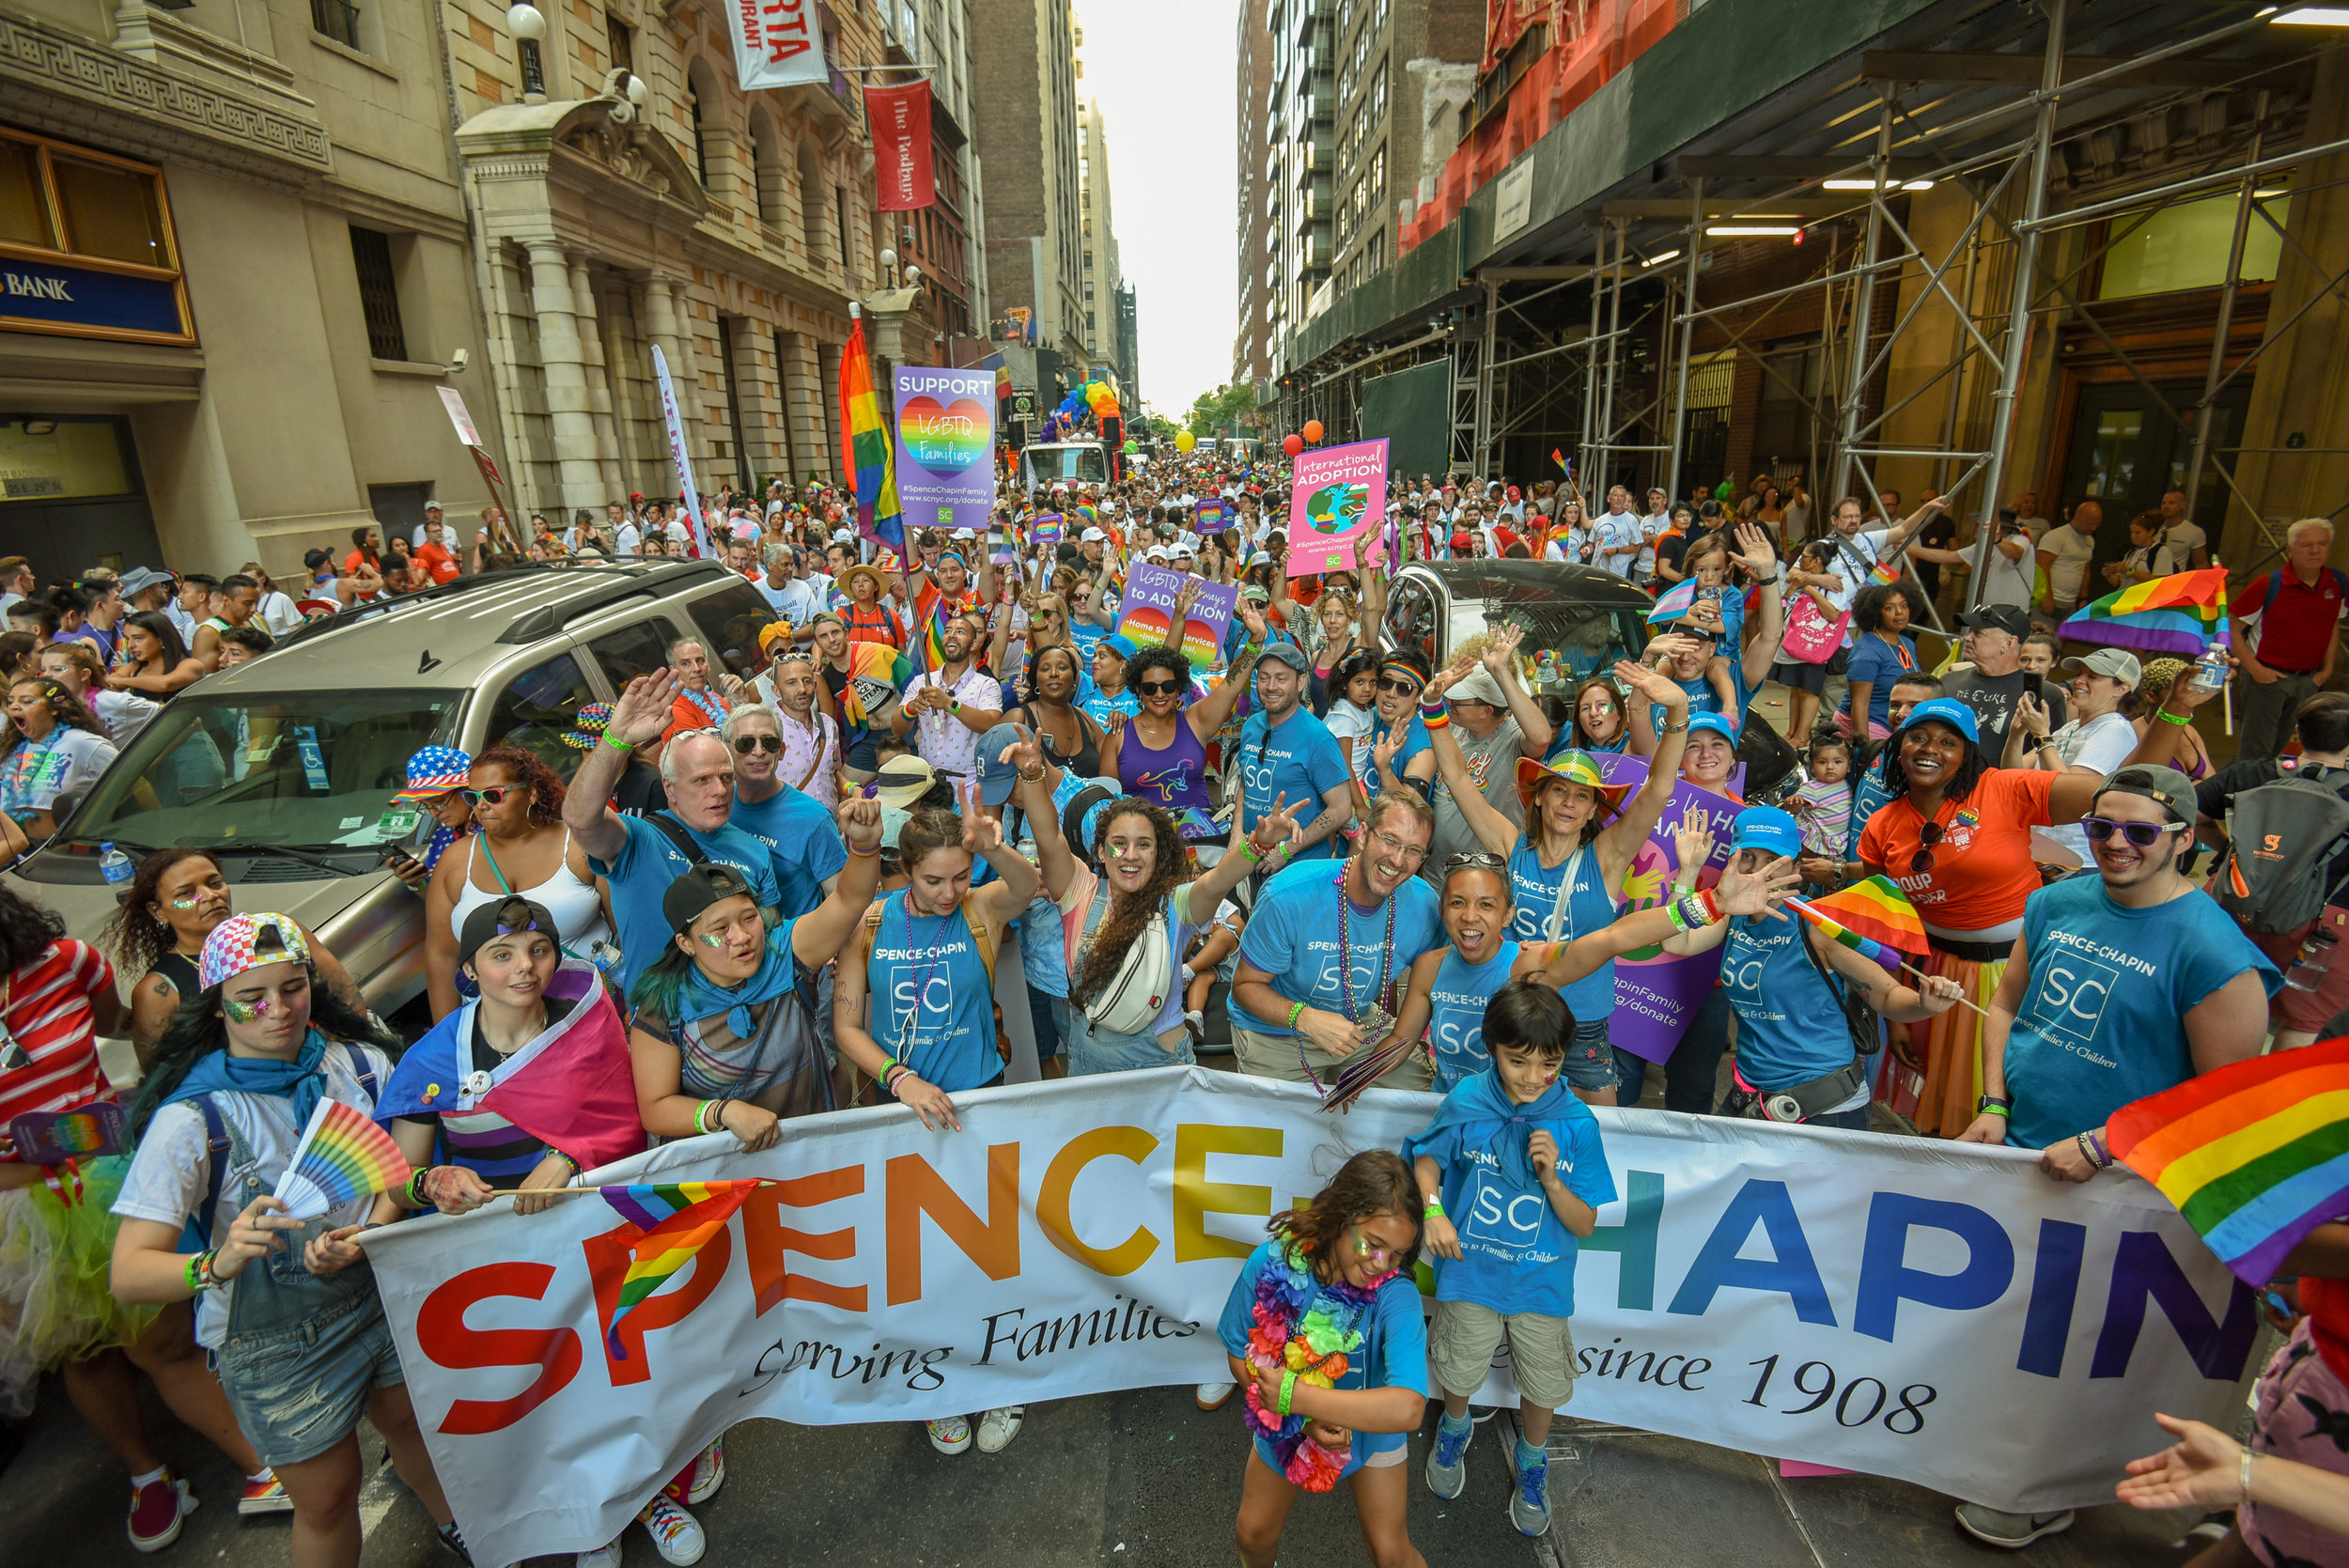 SC-PrideParade-2019_FE-207.jpg